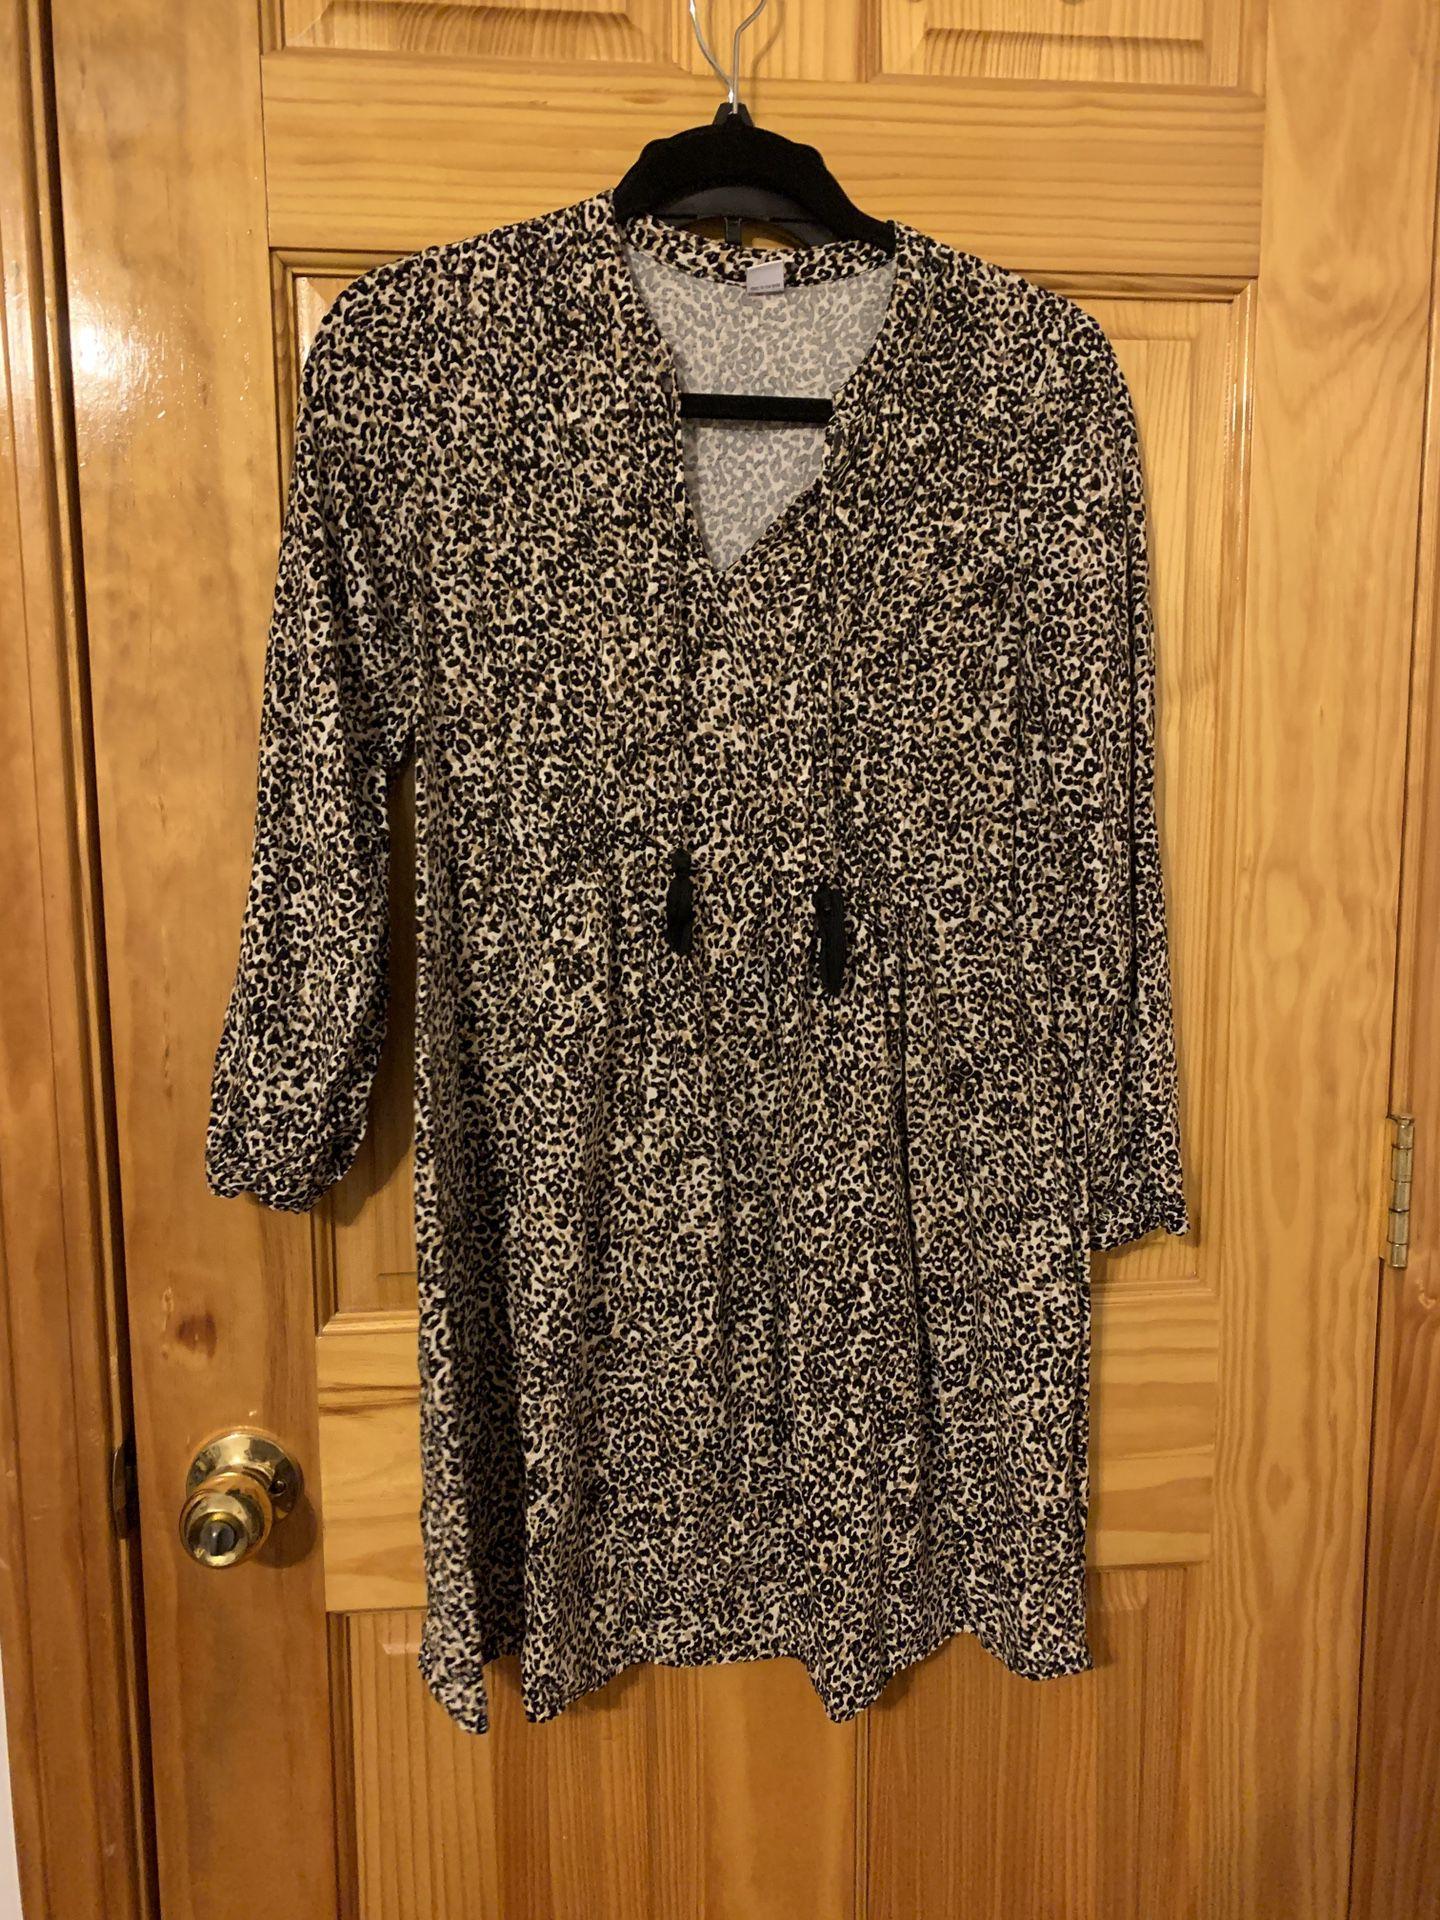 Cheetah Print Summer Dress Light Fabric Size Small